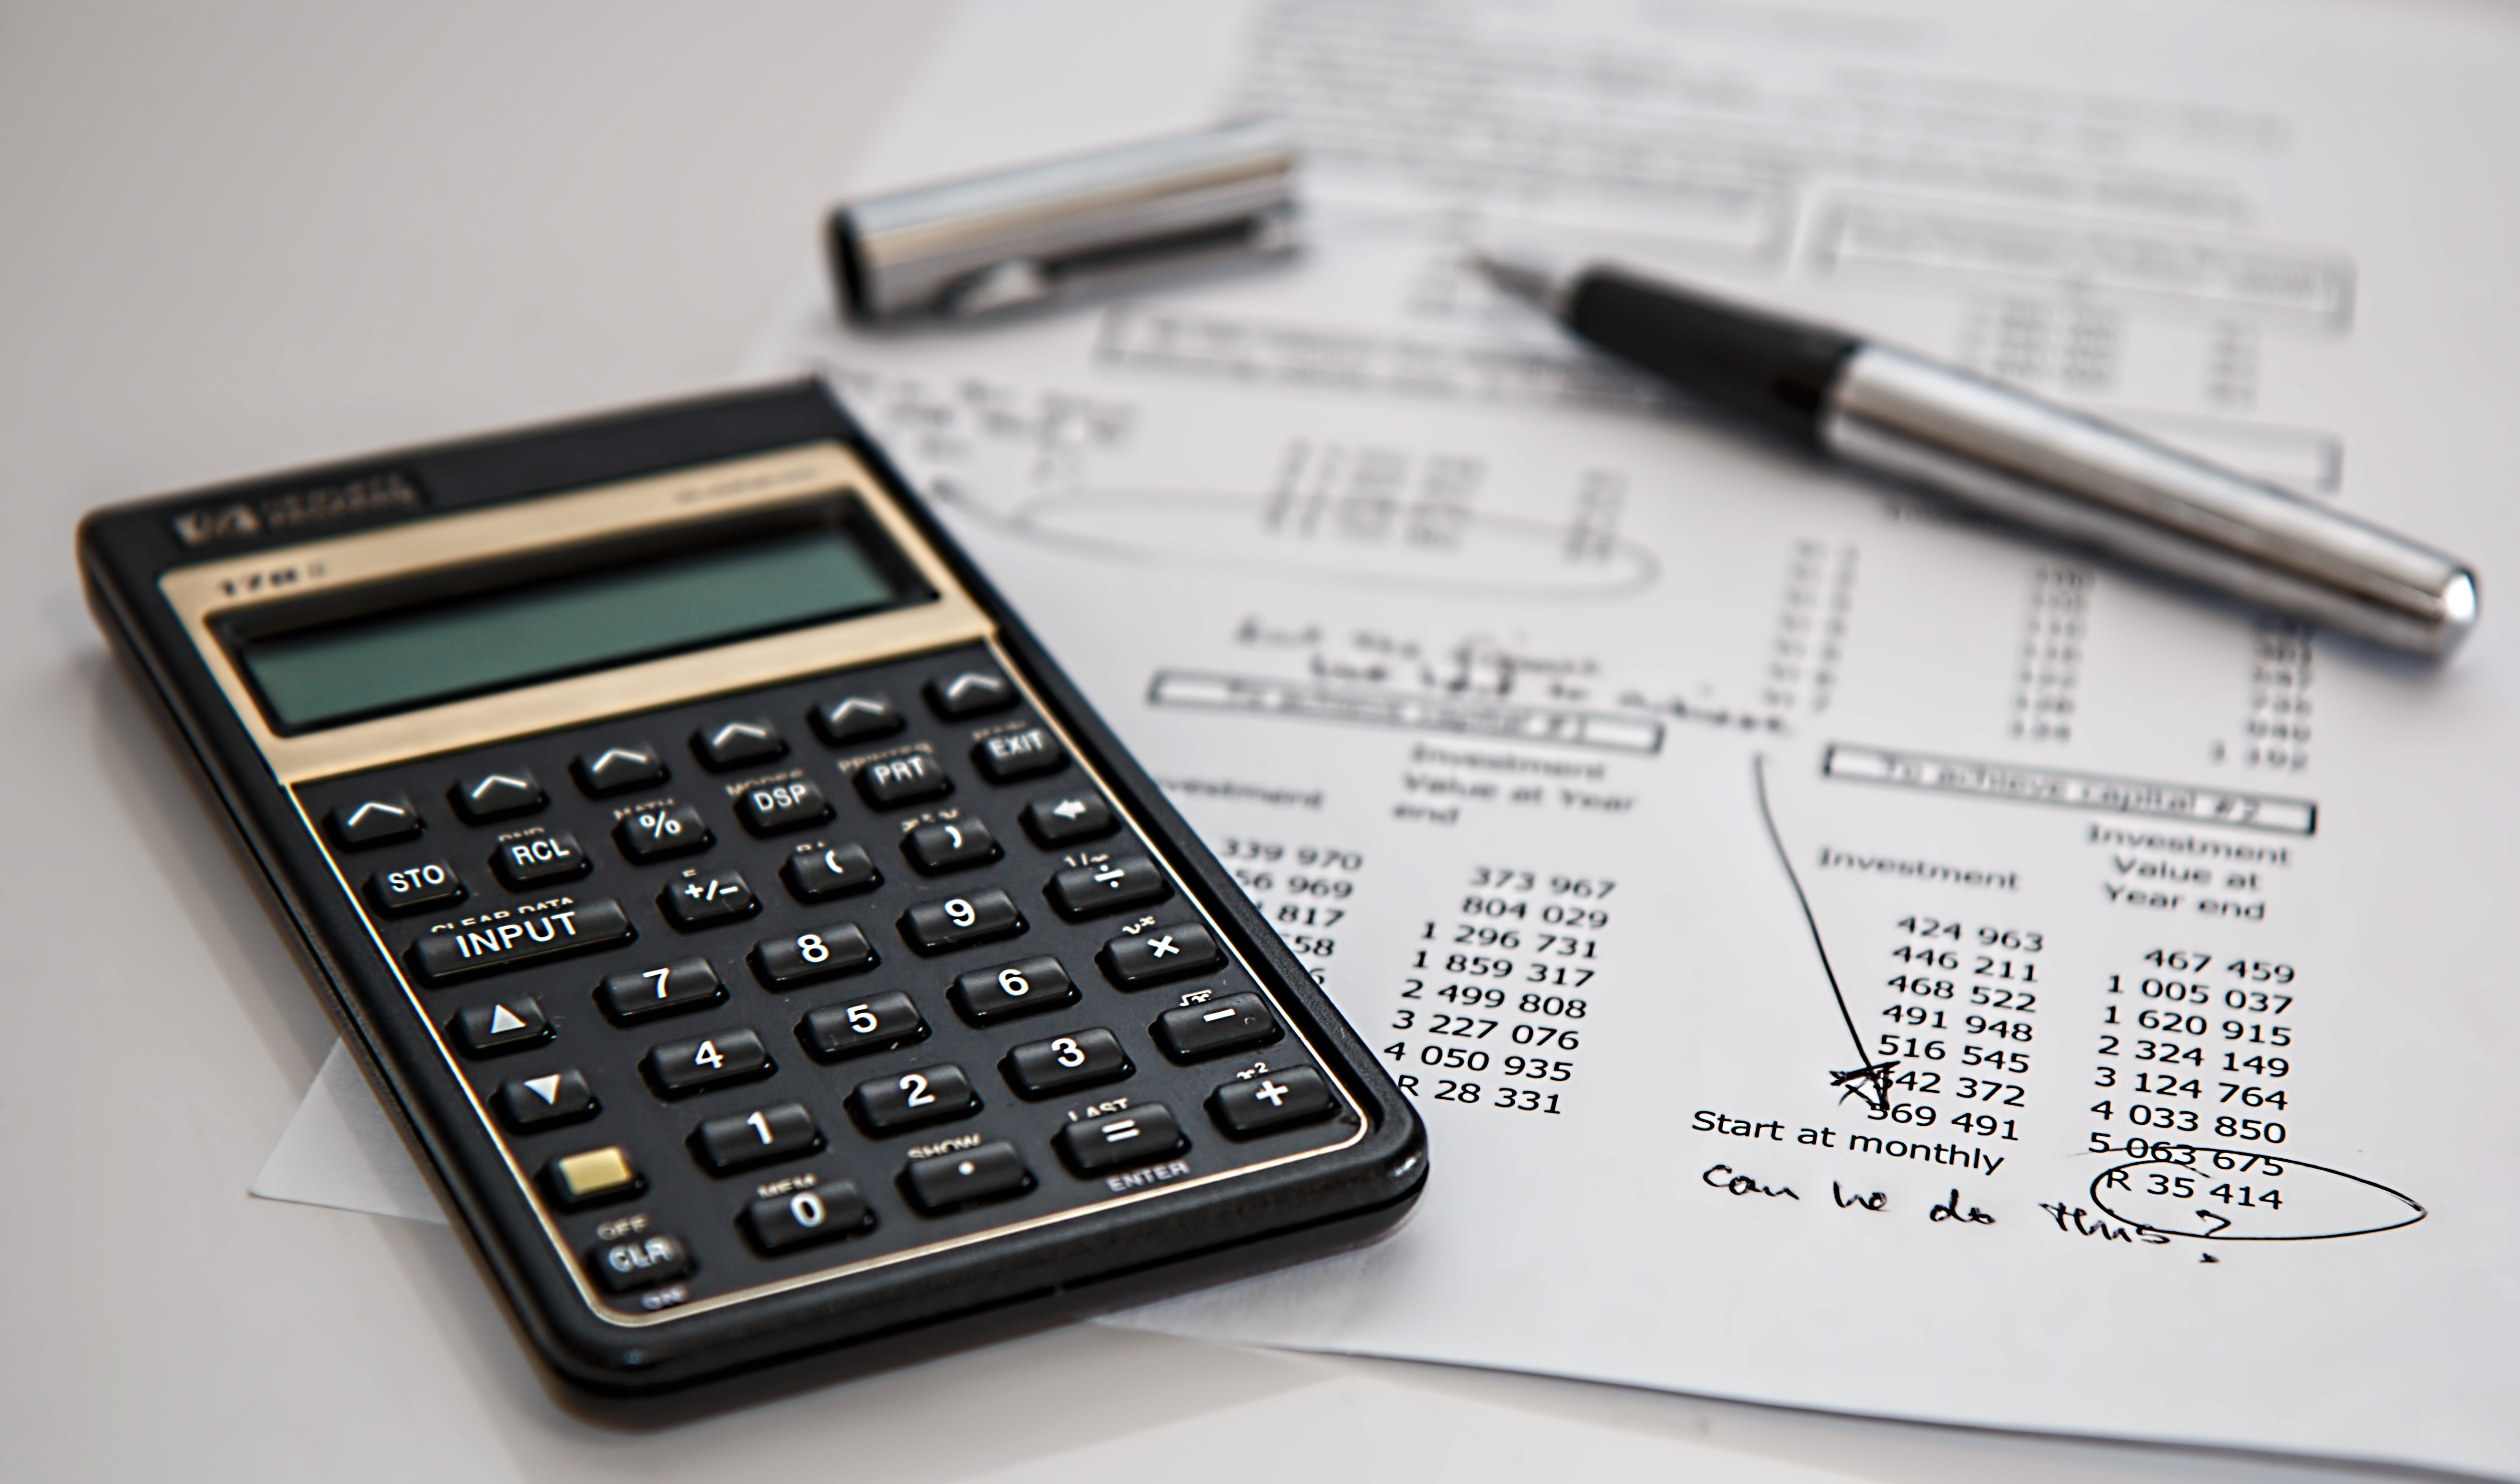 Lei Complementar nº 186/2021 prorroga por até quinze anos as isenções, incentivos e benefícios fiscais ou financeiro-fiscais previstos na Lei Complementar nº 160/2017